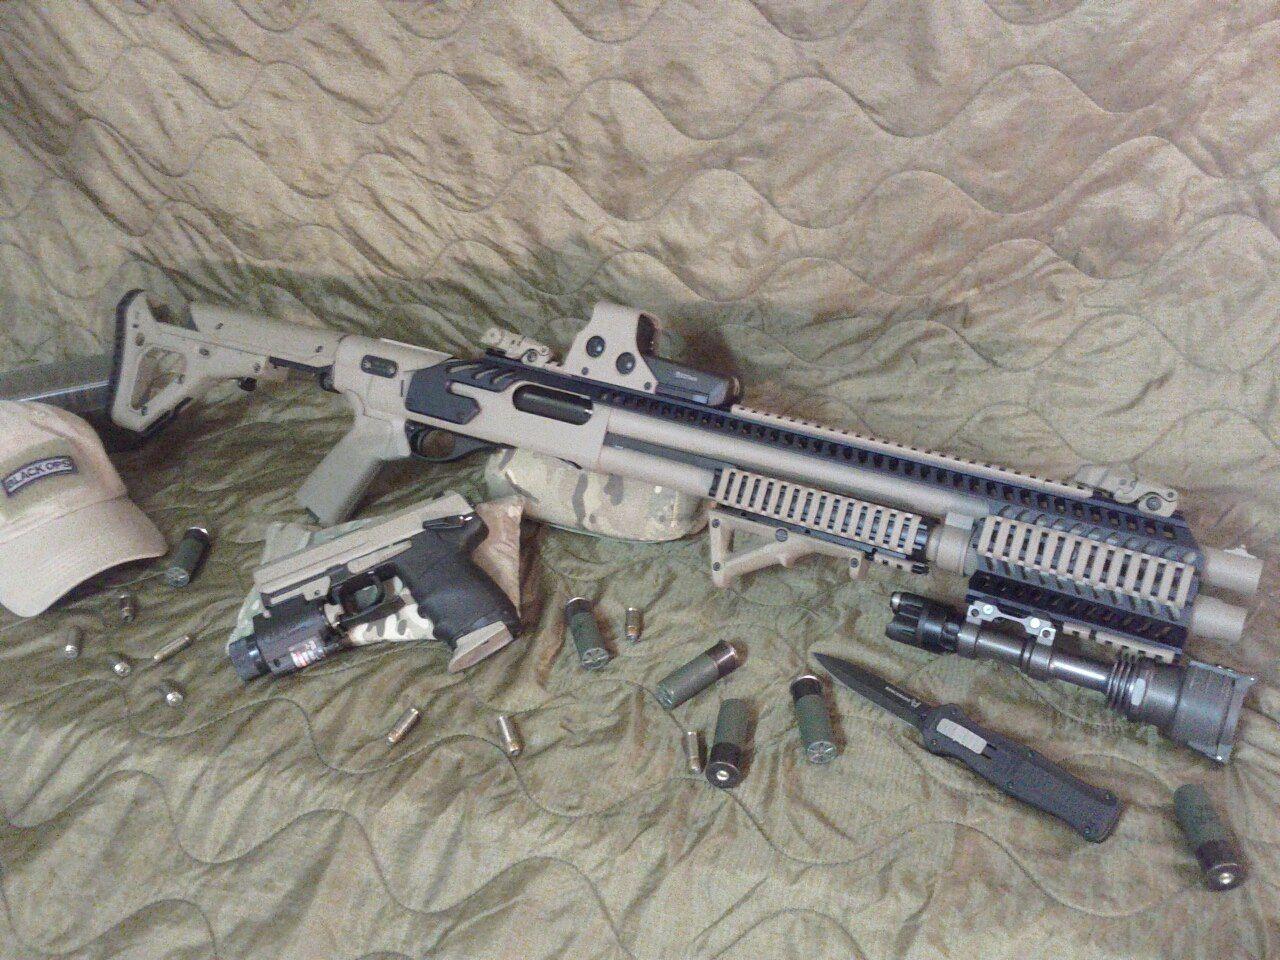 Rhino rail 870 | Shotguns | Guns, Tactical shotgun, Shotgun